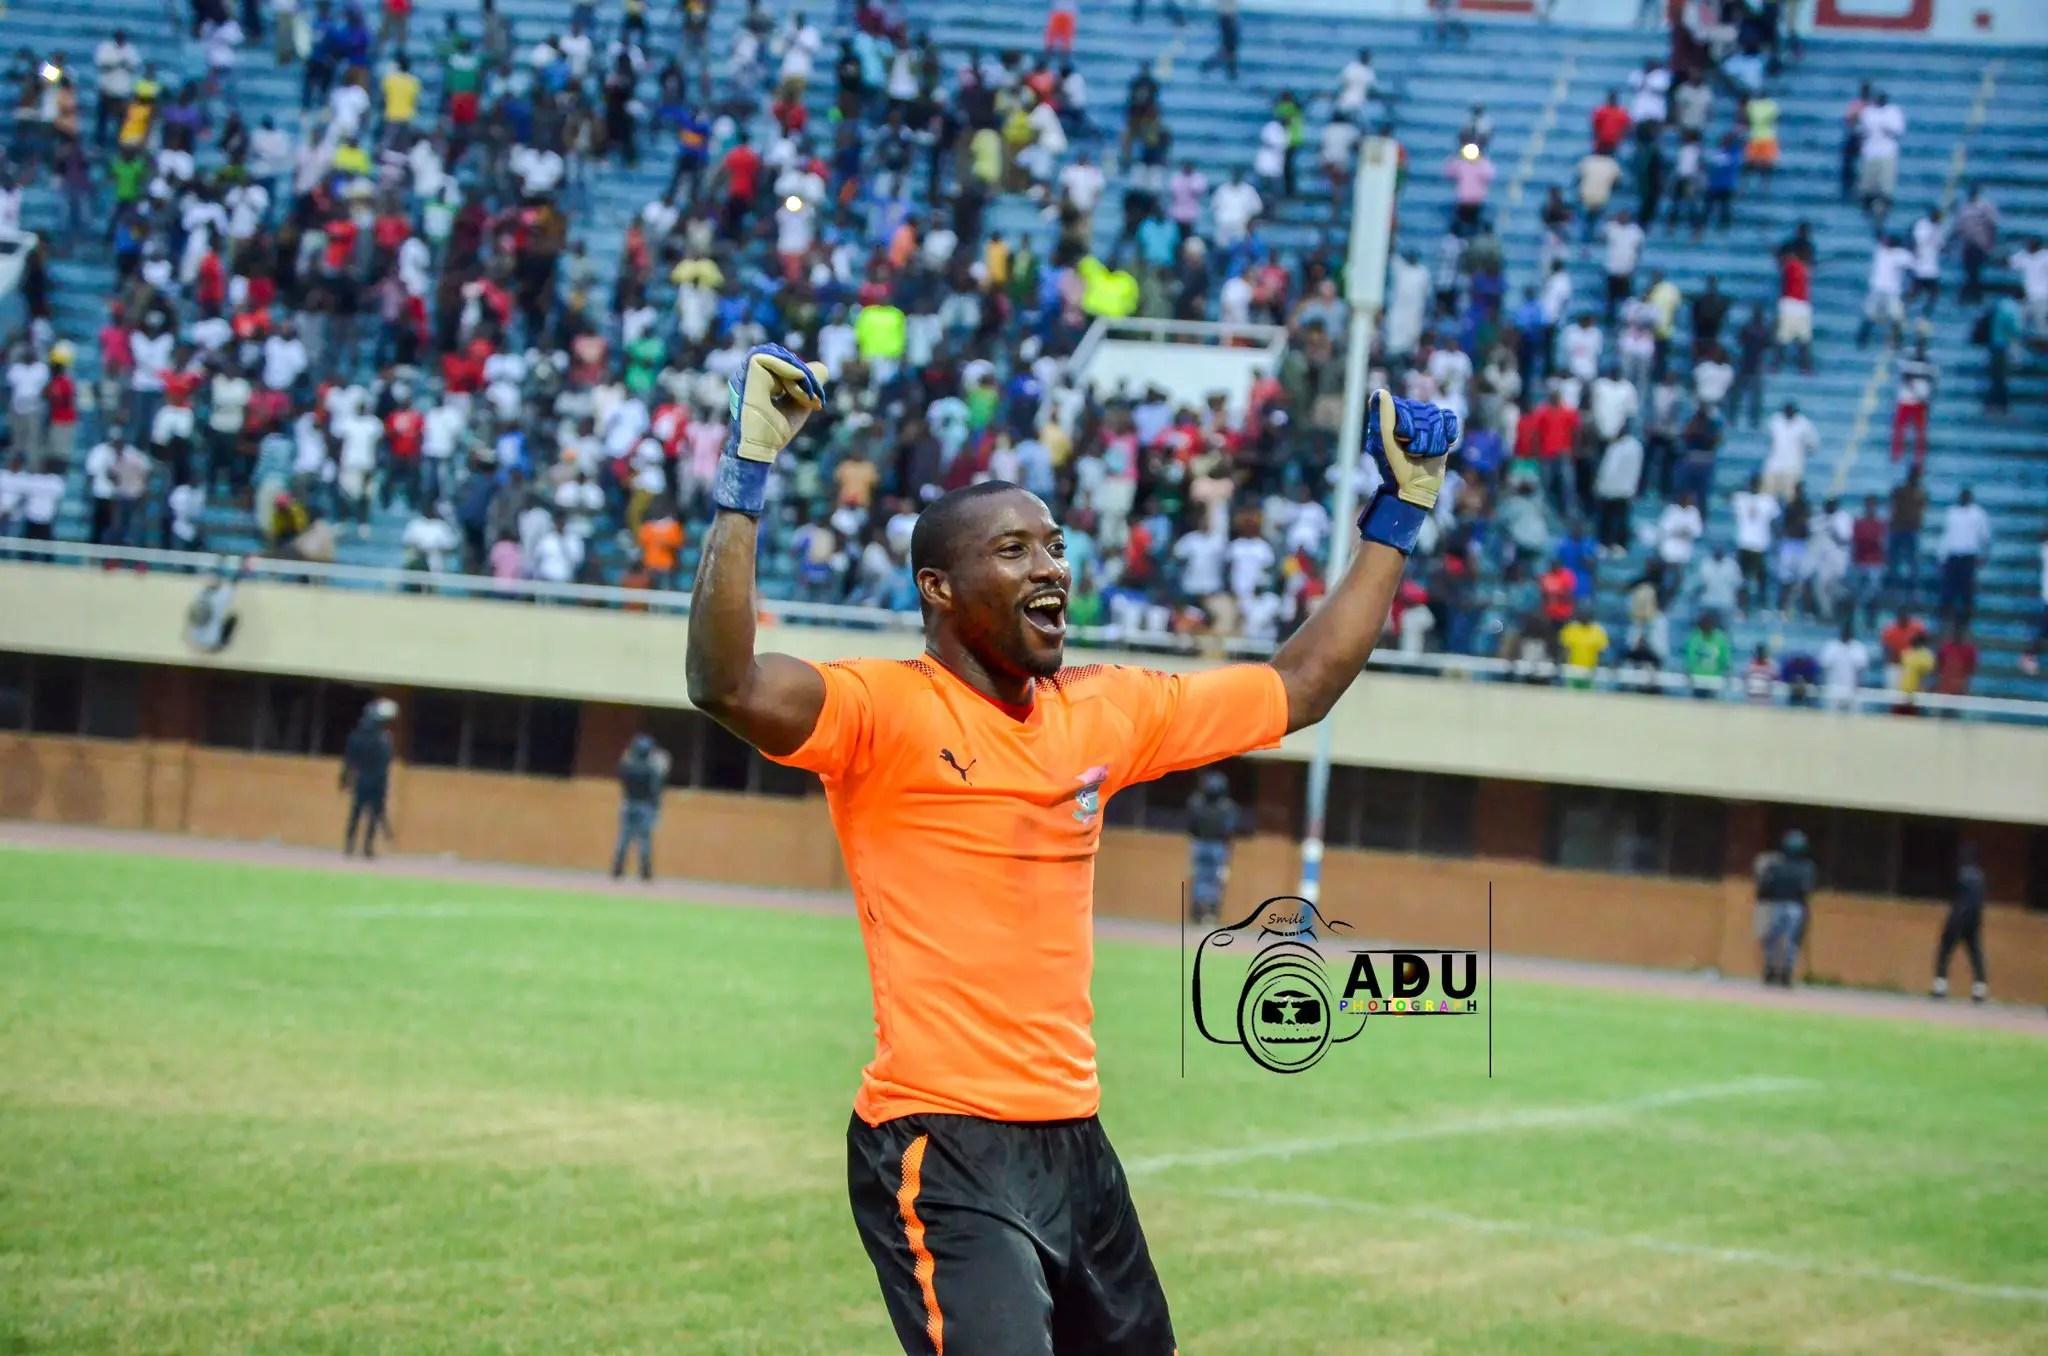 Gambia Goalie Modou Joins Saudi's Jeddah From El-Kanemi